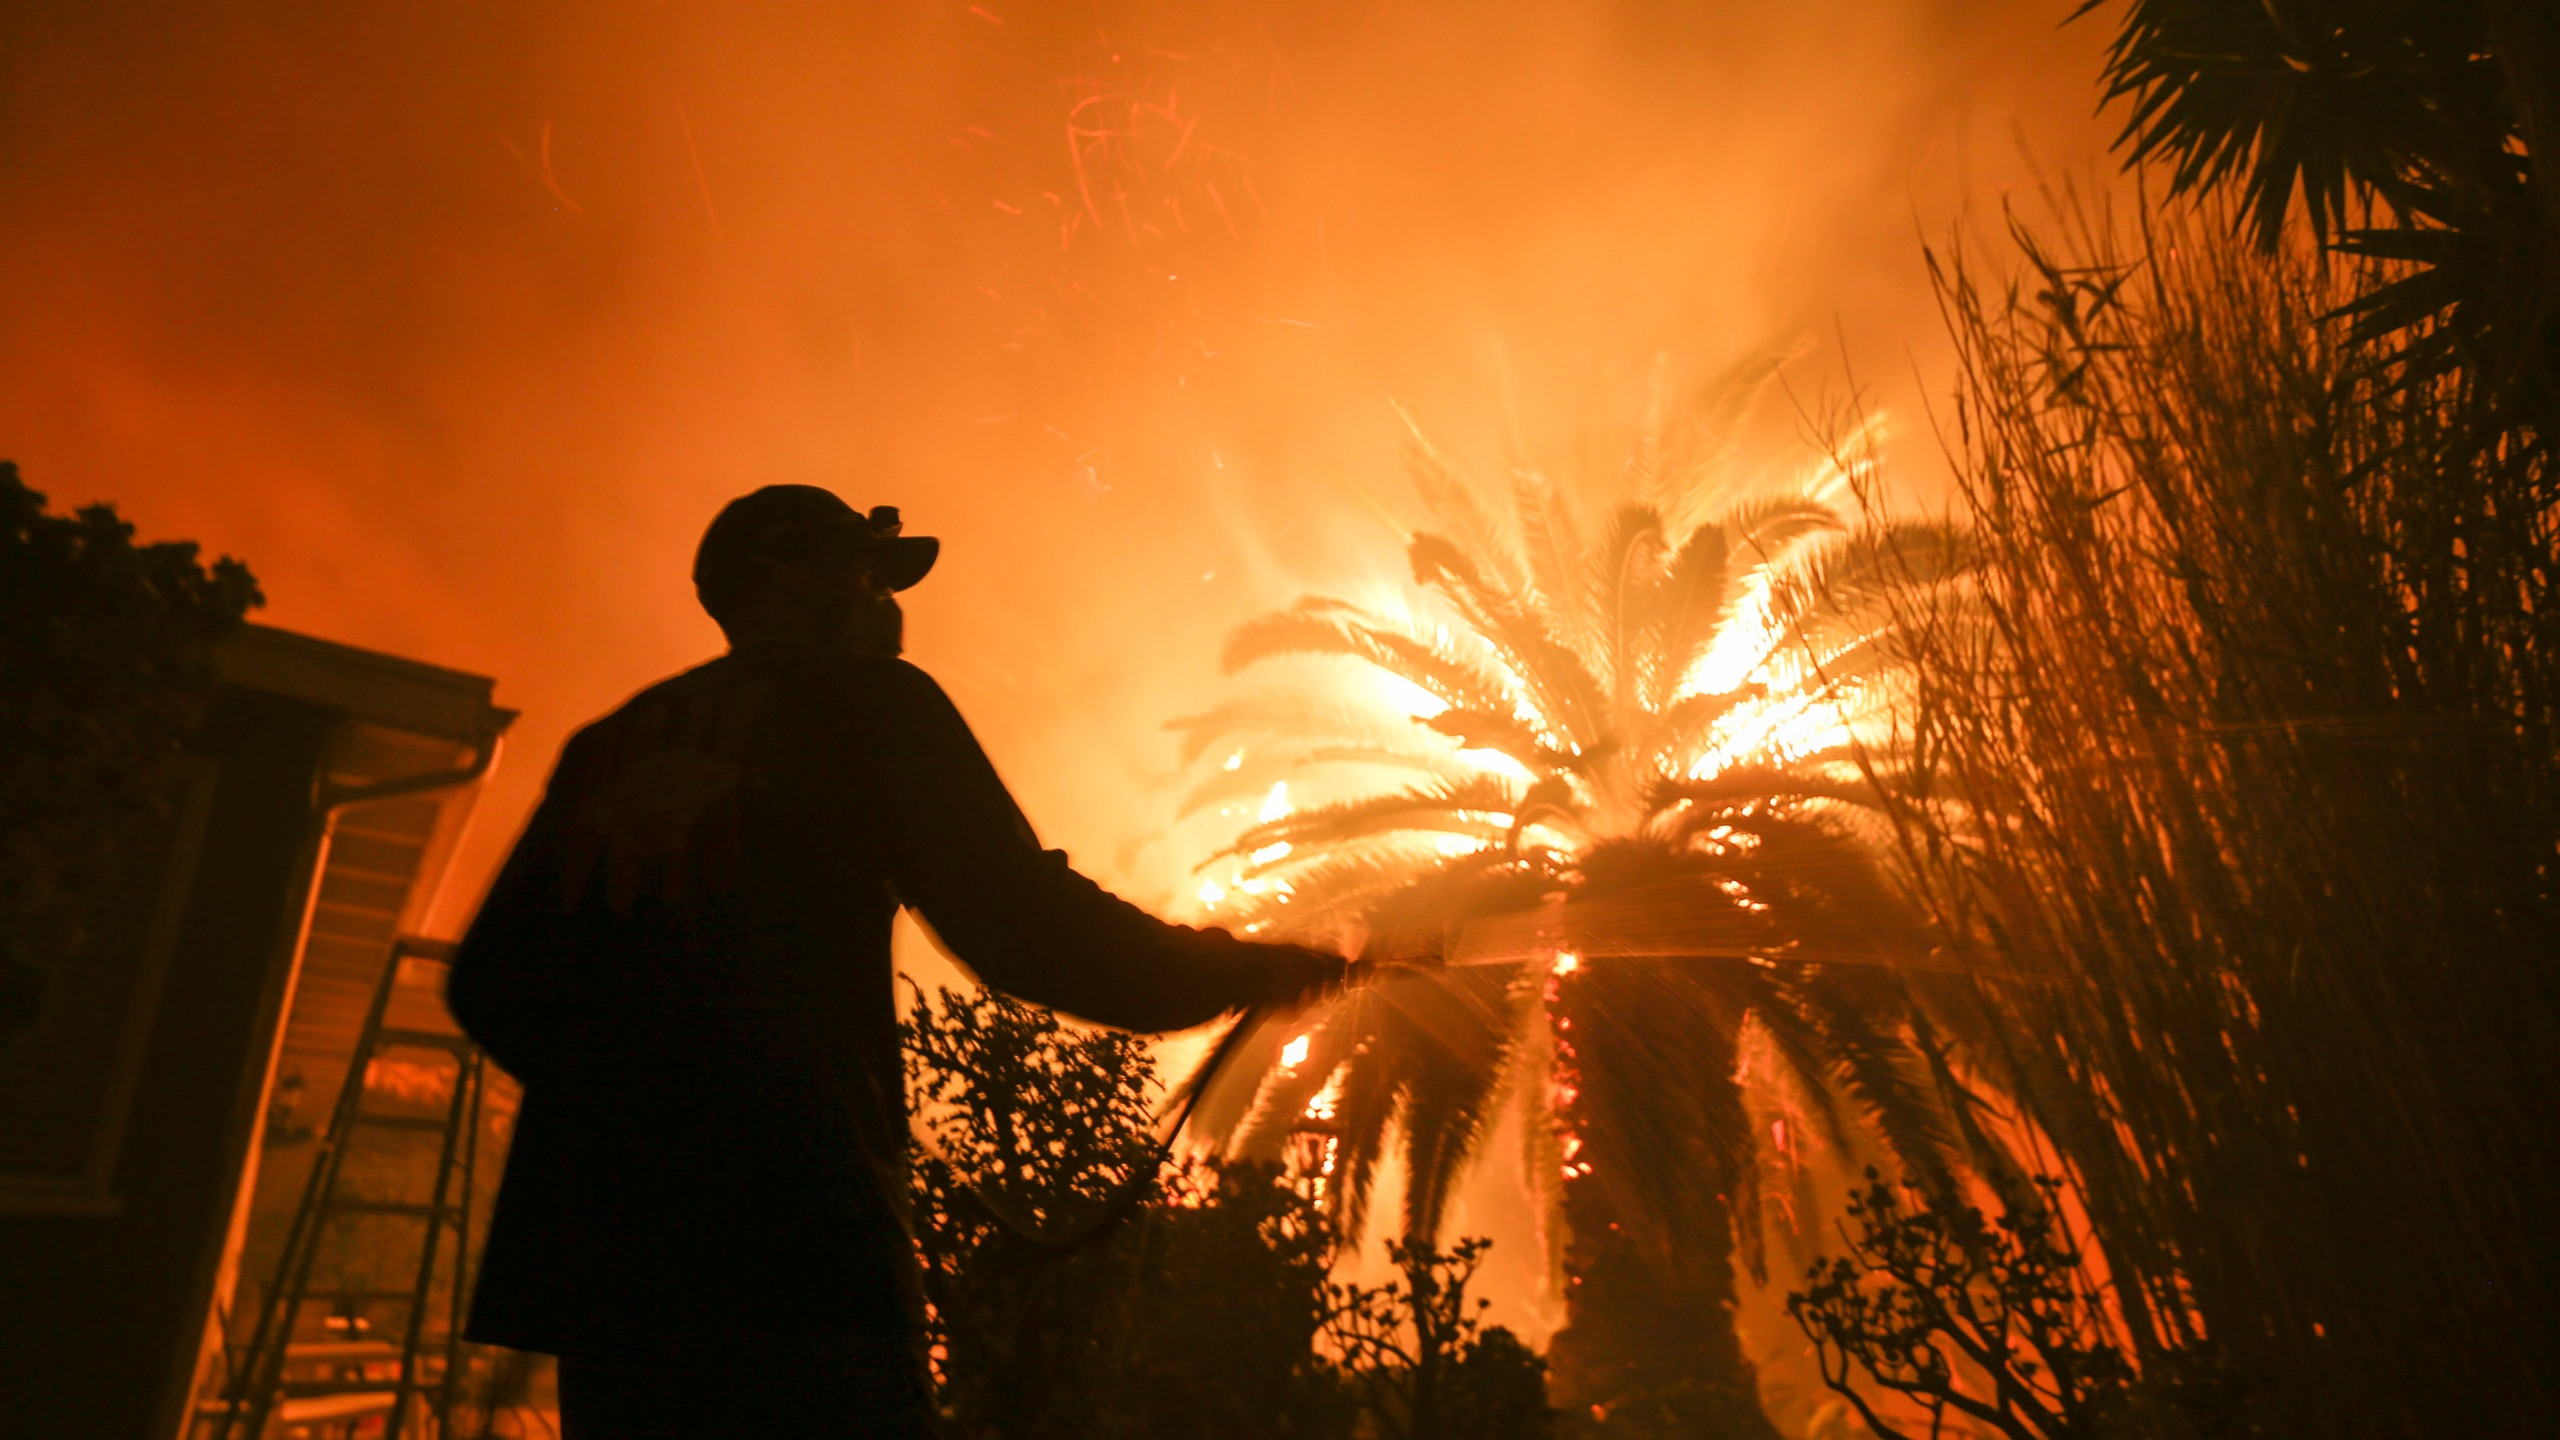 APTOPIX_California_Wildfires_47191-159532.jpg56932397